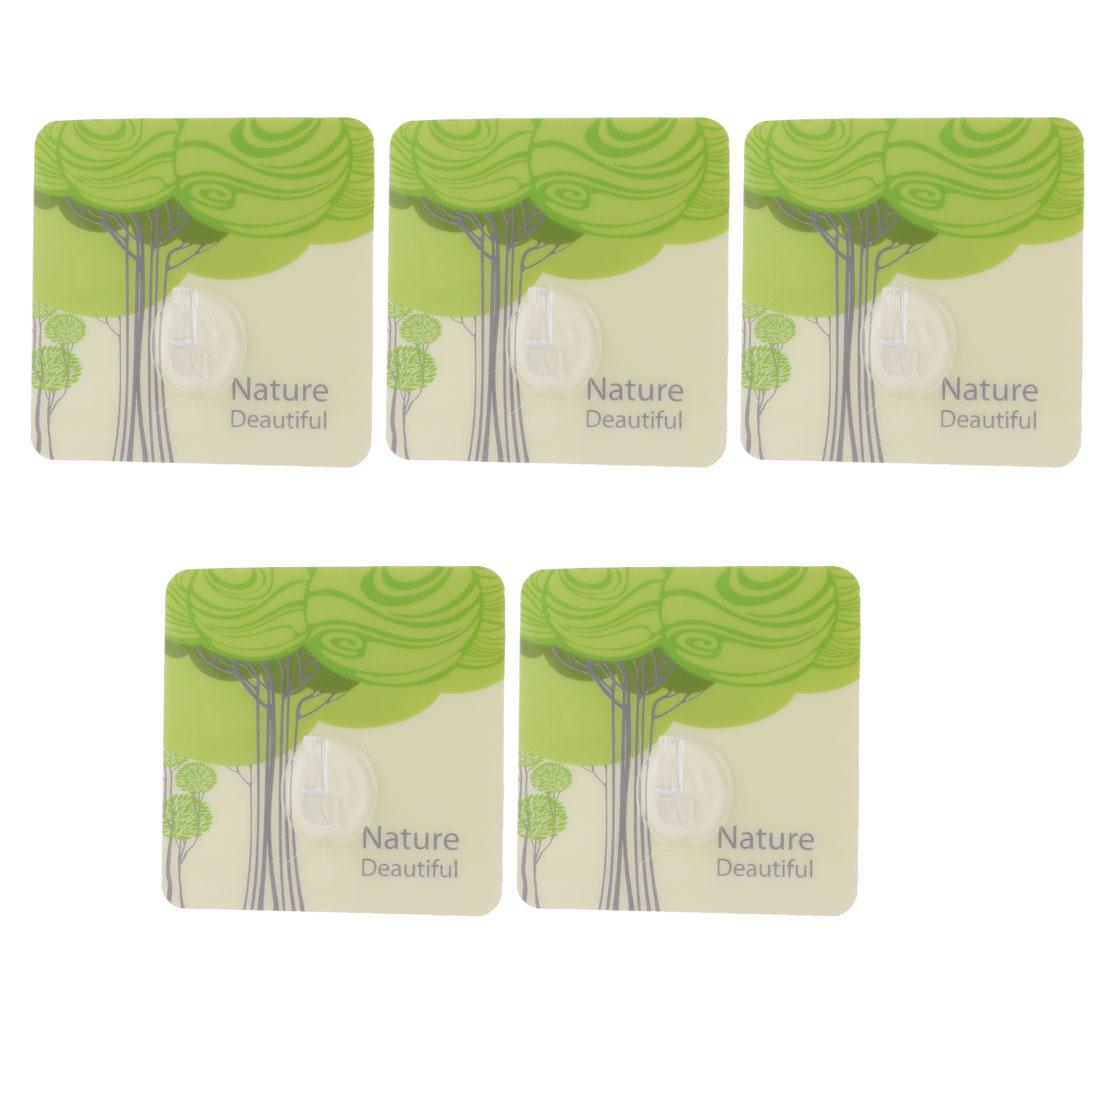 Home PVC Square Tree Pattern Wall No Scratch Seamless Adhesive Hooks Green 5pcs